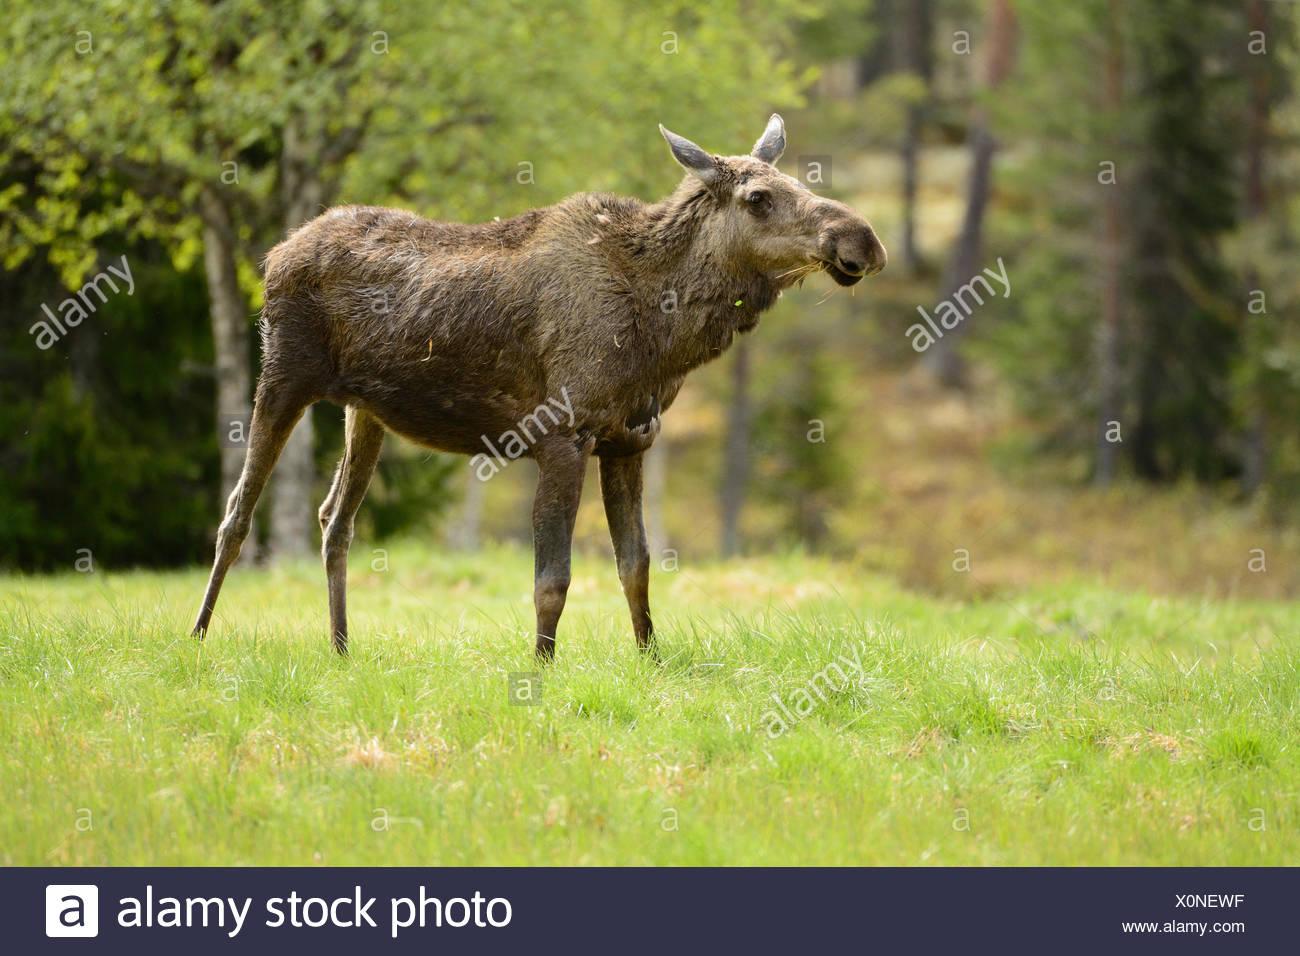 Moose, Alces alces, Cervidae, mammal, animal, Idre, Dalarna, Sweden - Stock Image